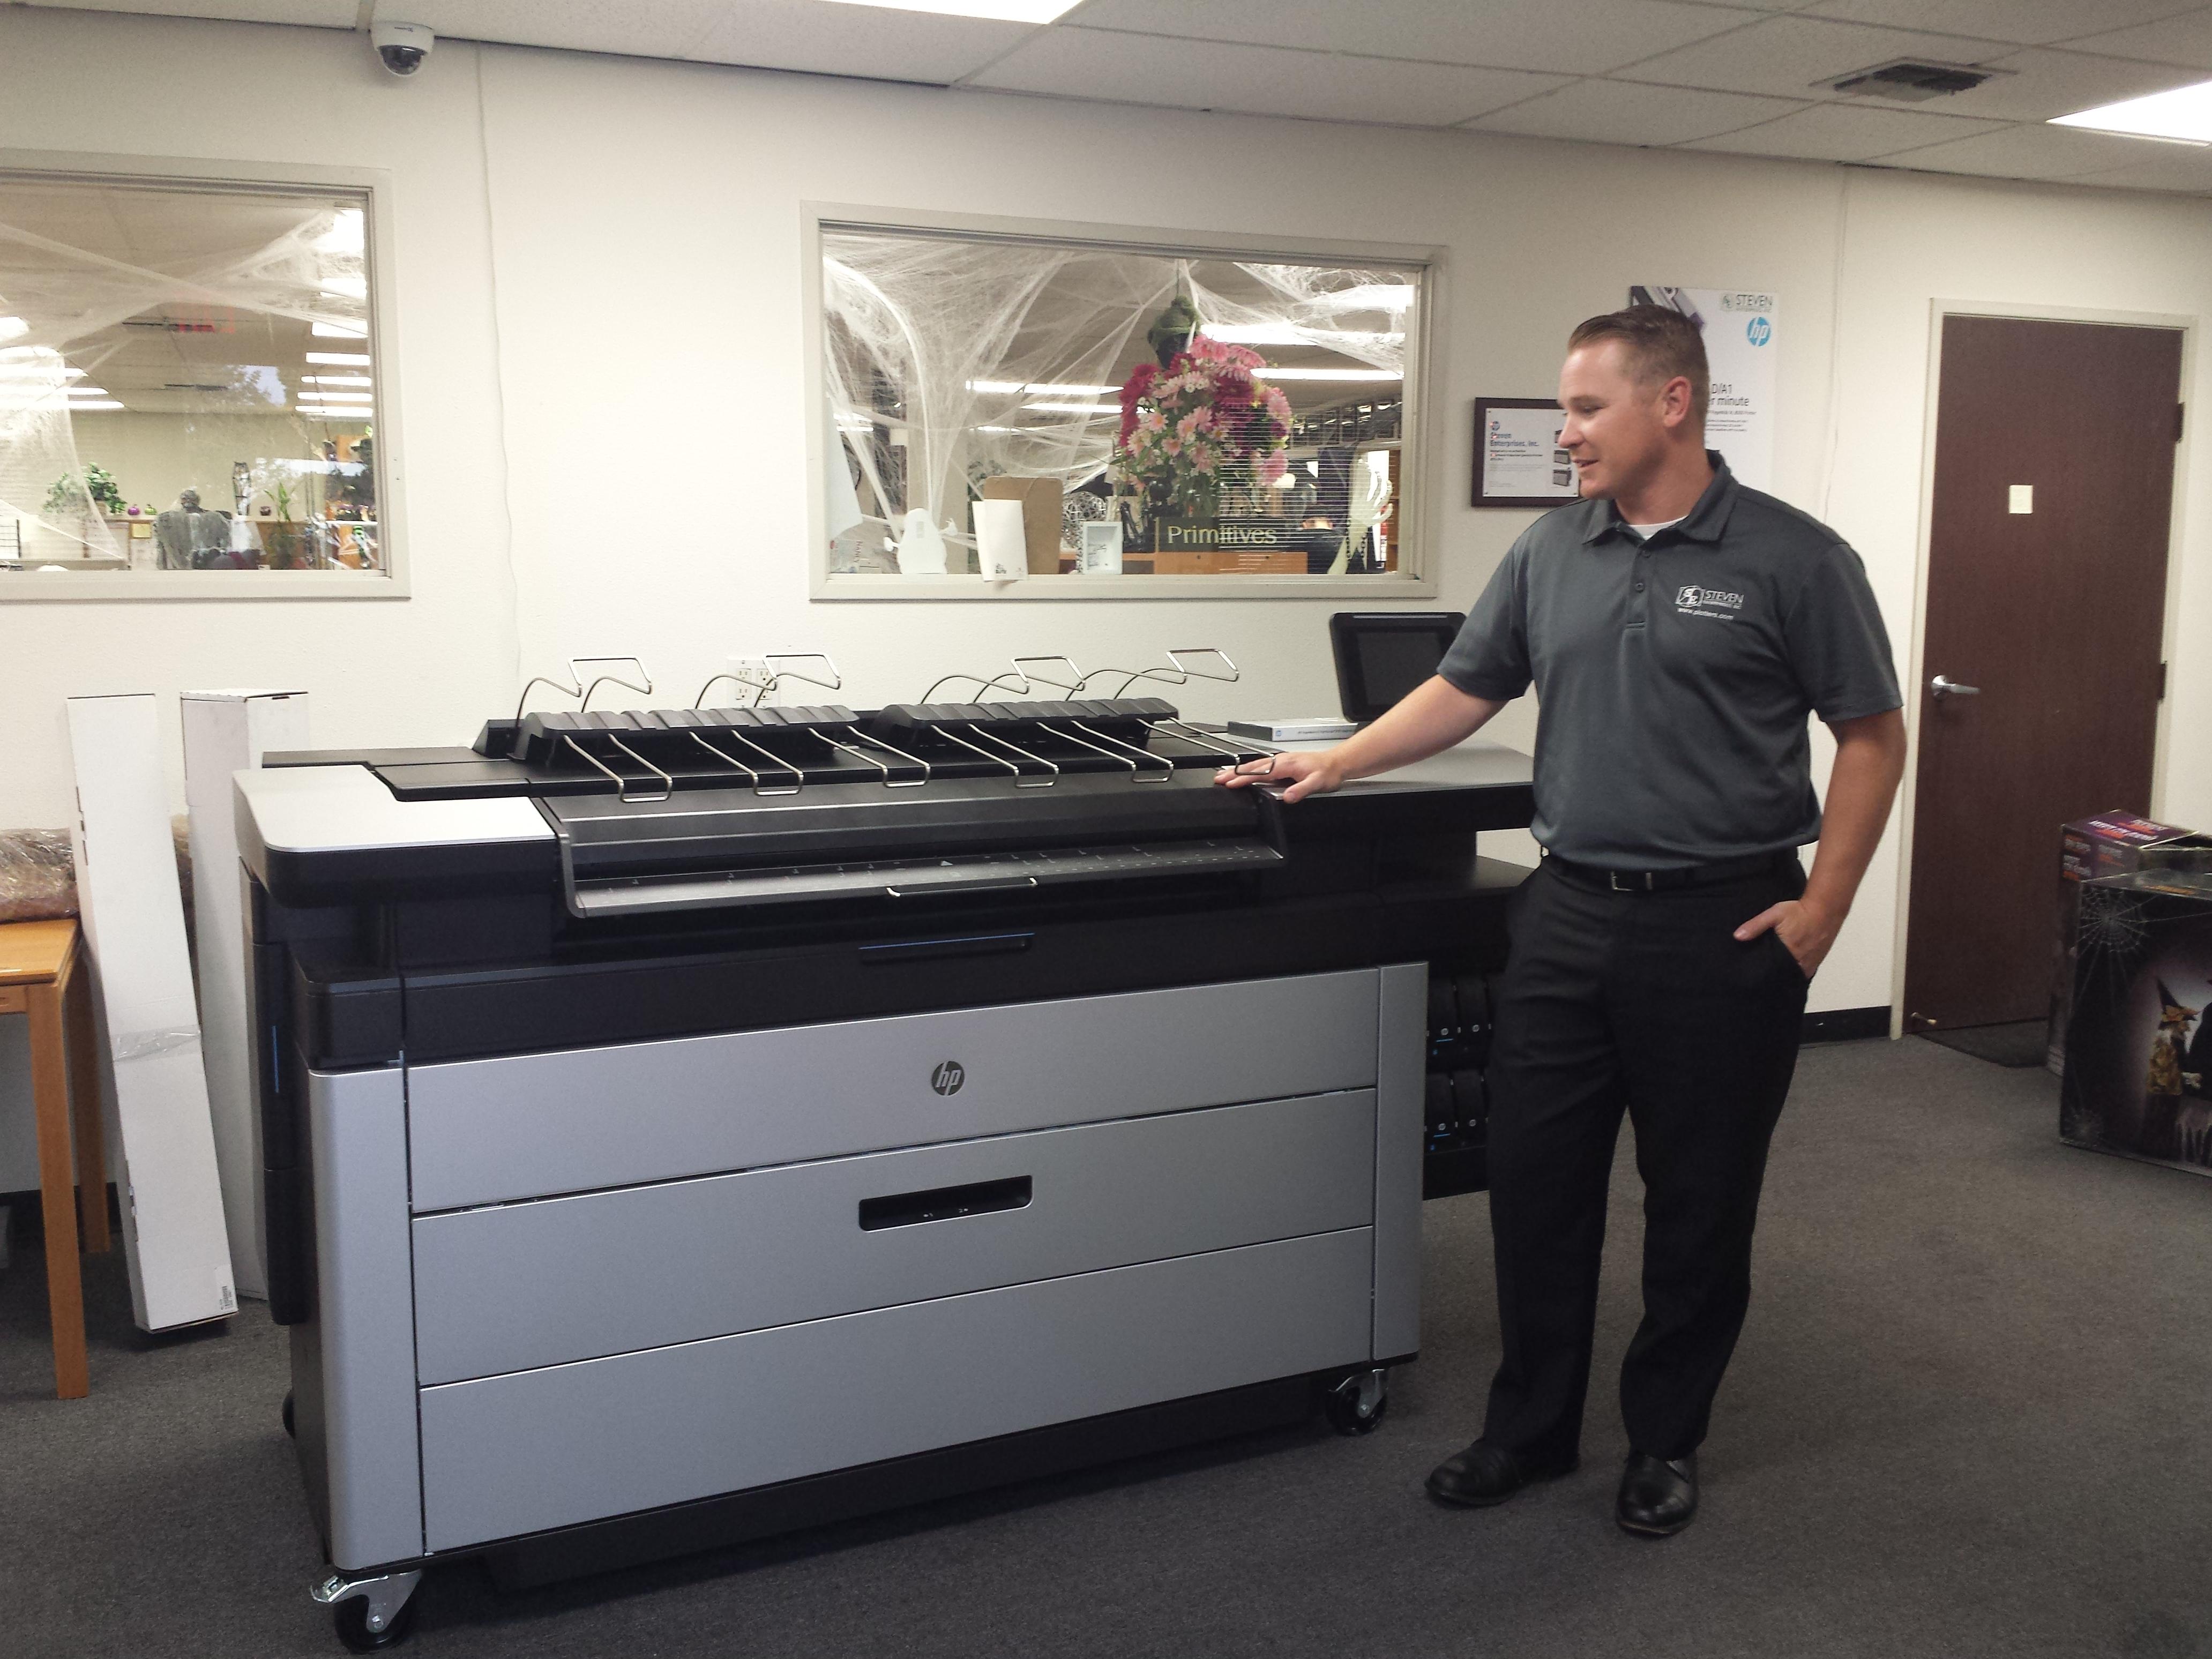 Steven Enterprises Printer with worker